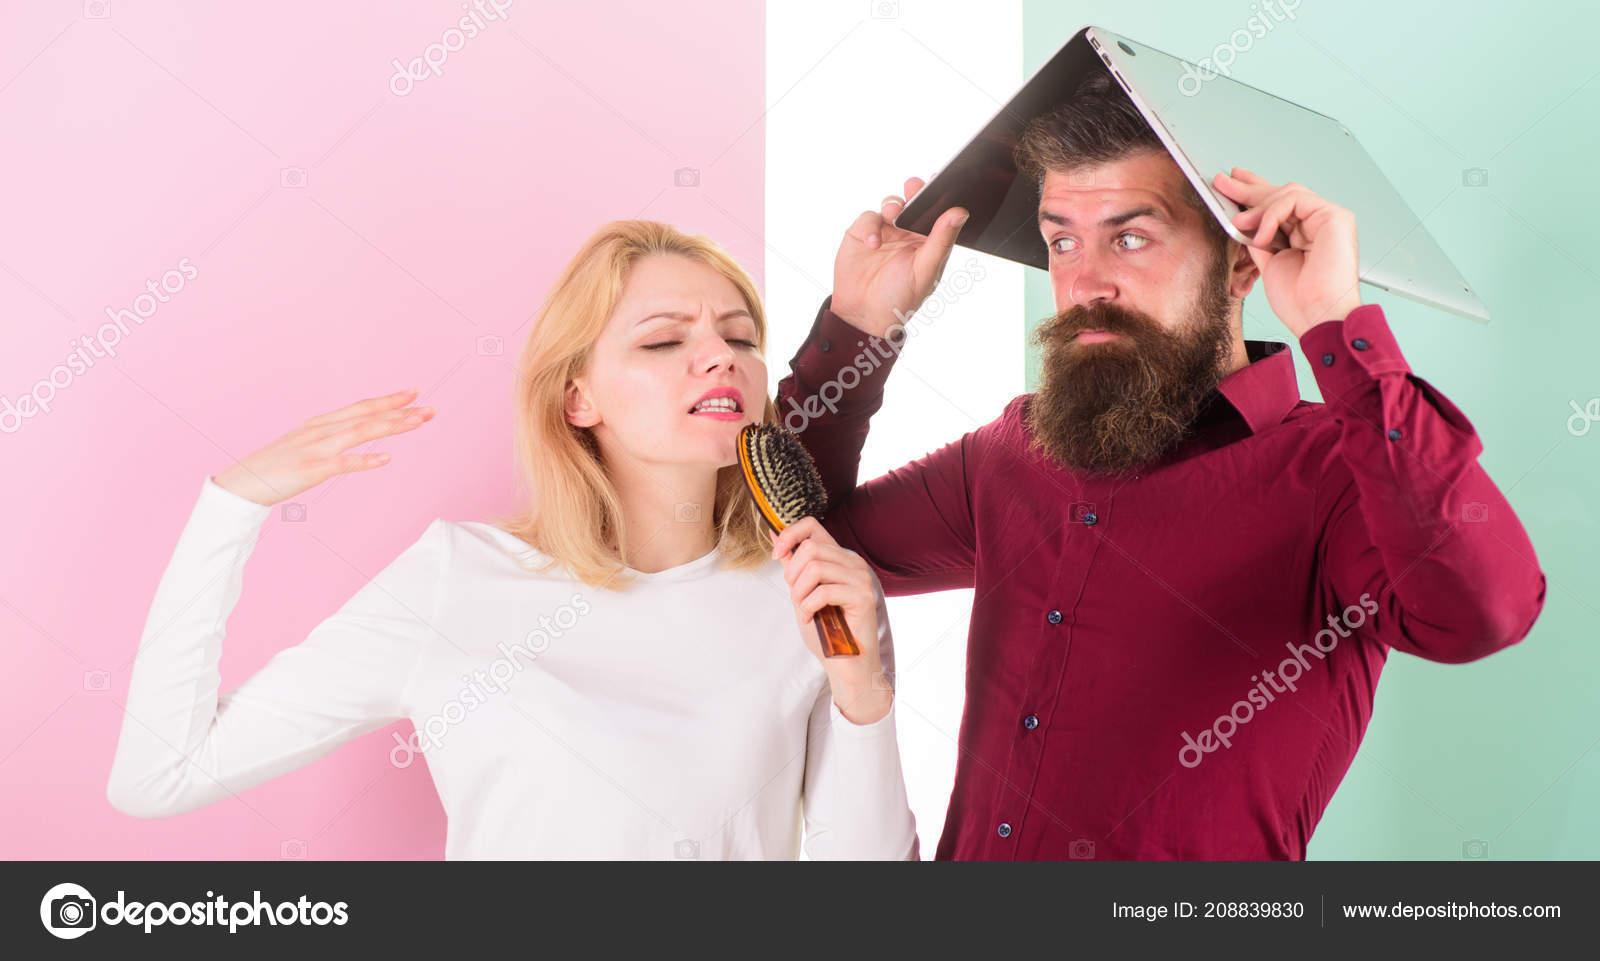 Señora horrible voz cantar utilizando cepillo de pelo como micrófono  mientras que hombre molesto escondido debajo del ordenador portátil. 70d010bbd436